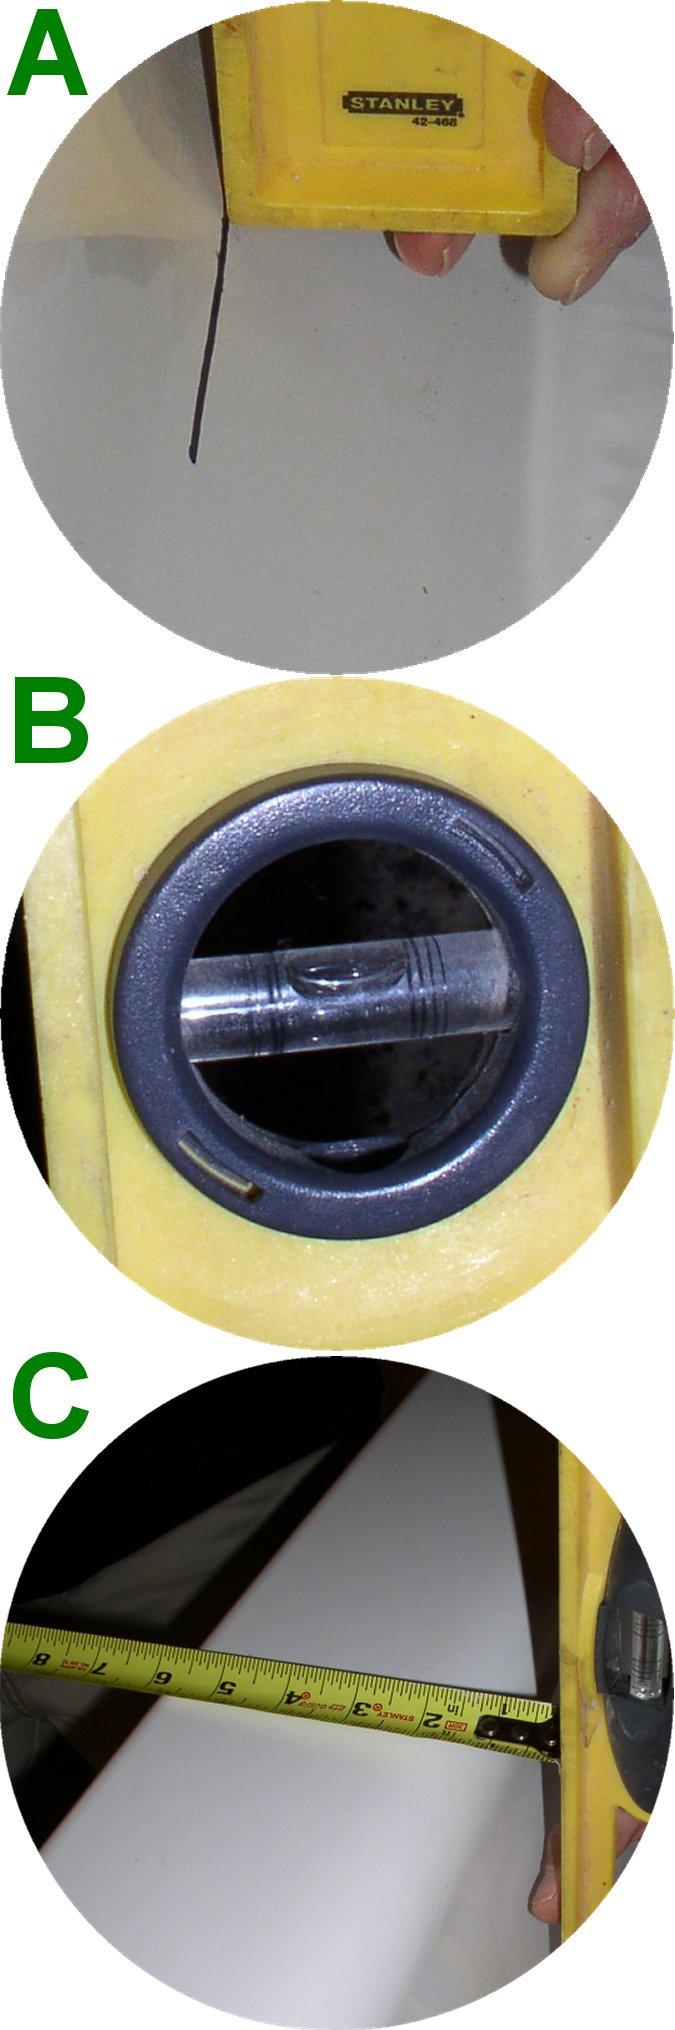 Tub To Shower Conversion Kit Measurements Convert Tub To